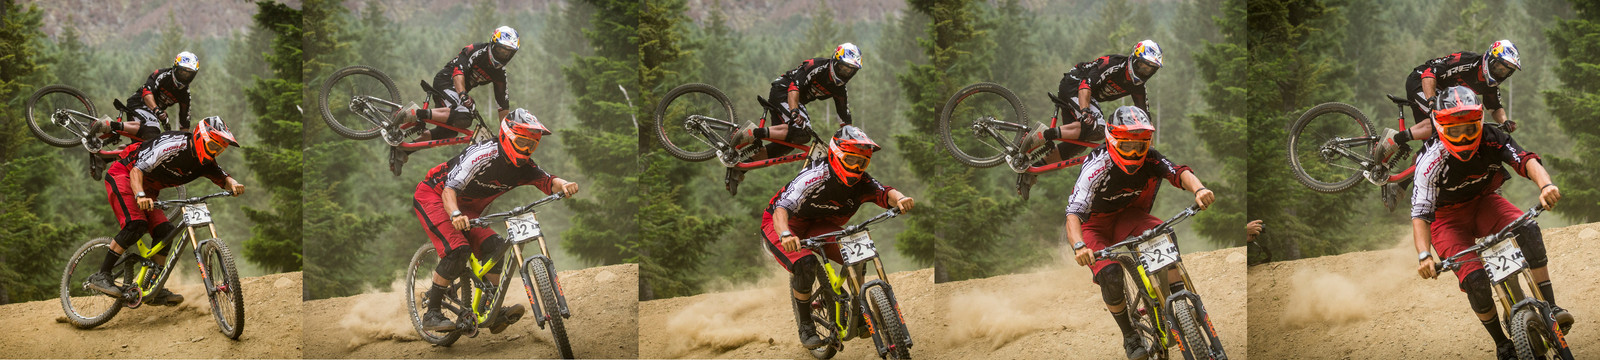 Captain Crooked and Sergeant Sideways - Vertigo Bikes Whip Off at the Atlas Bar Wynyard Jam - Mountain Biking Pictures - Vital MTB